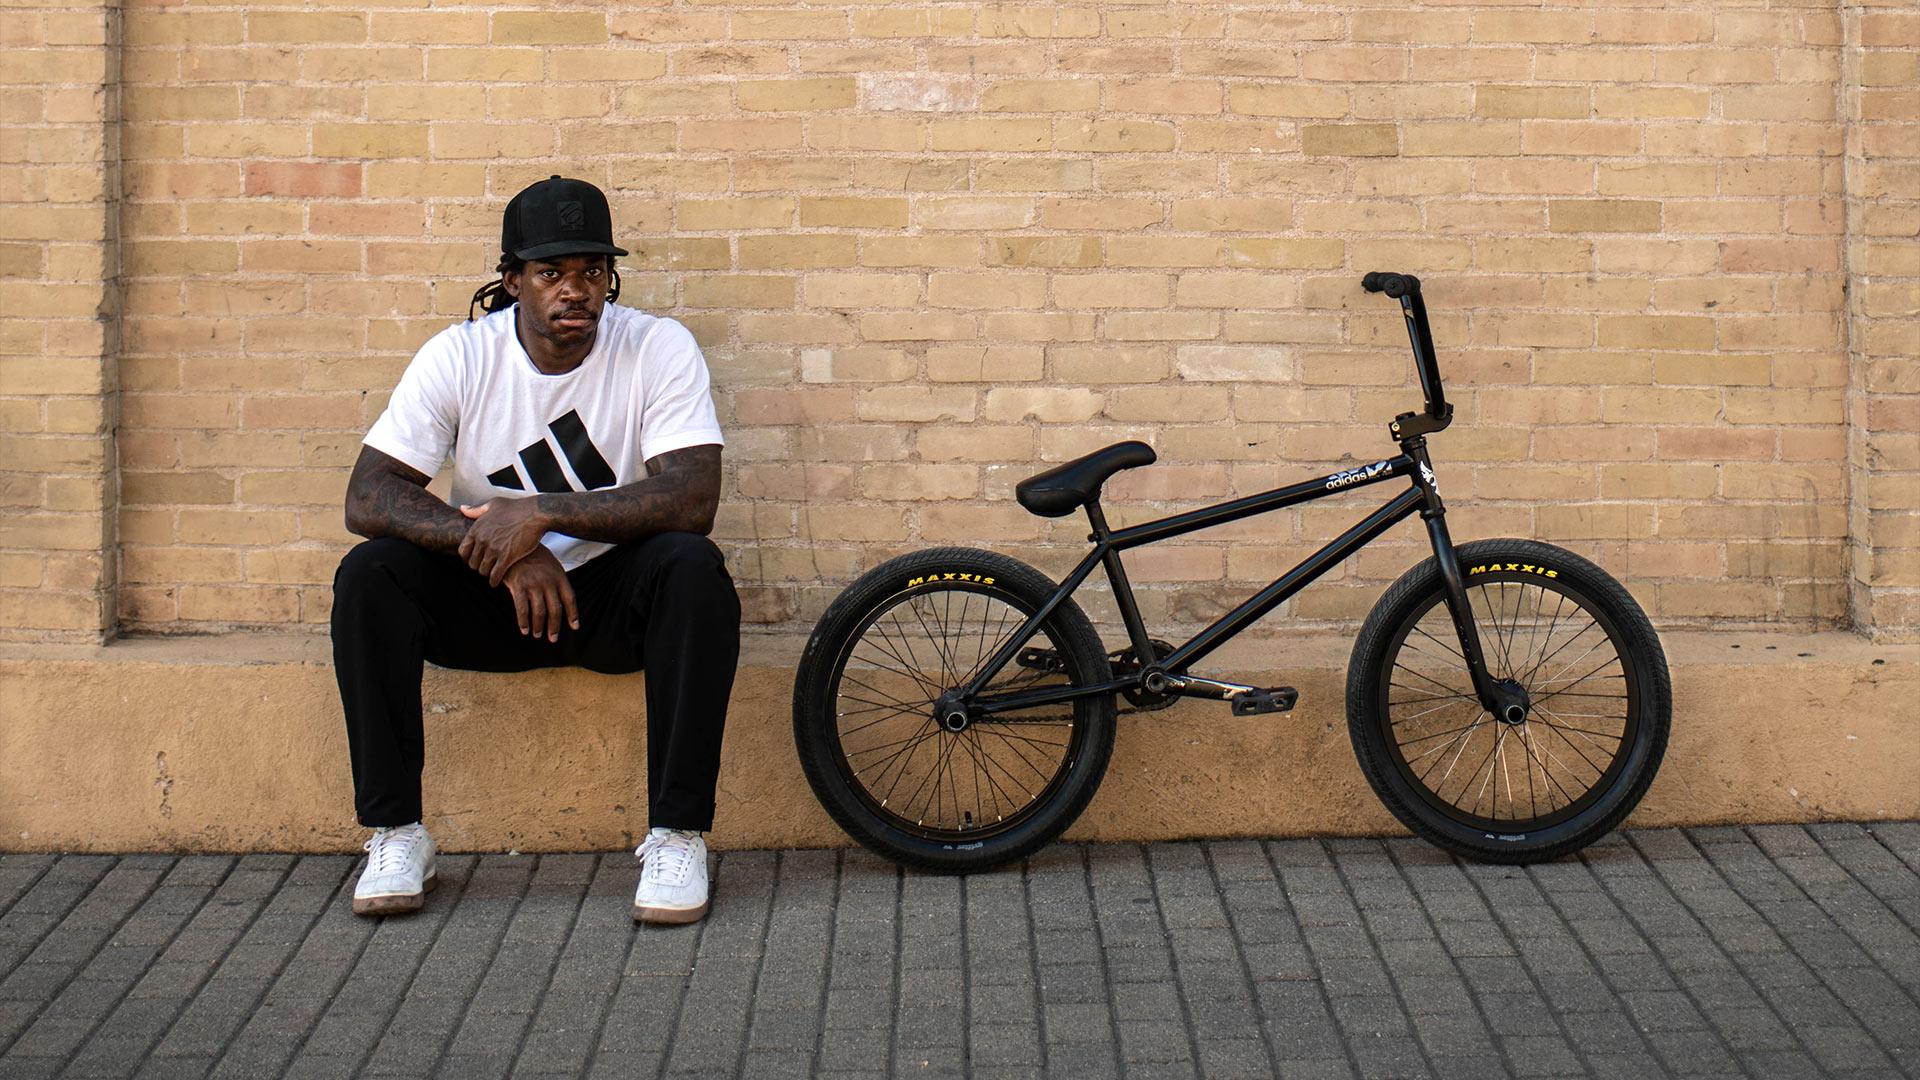 Brad Simms and his BMX bike